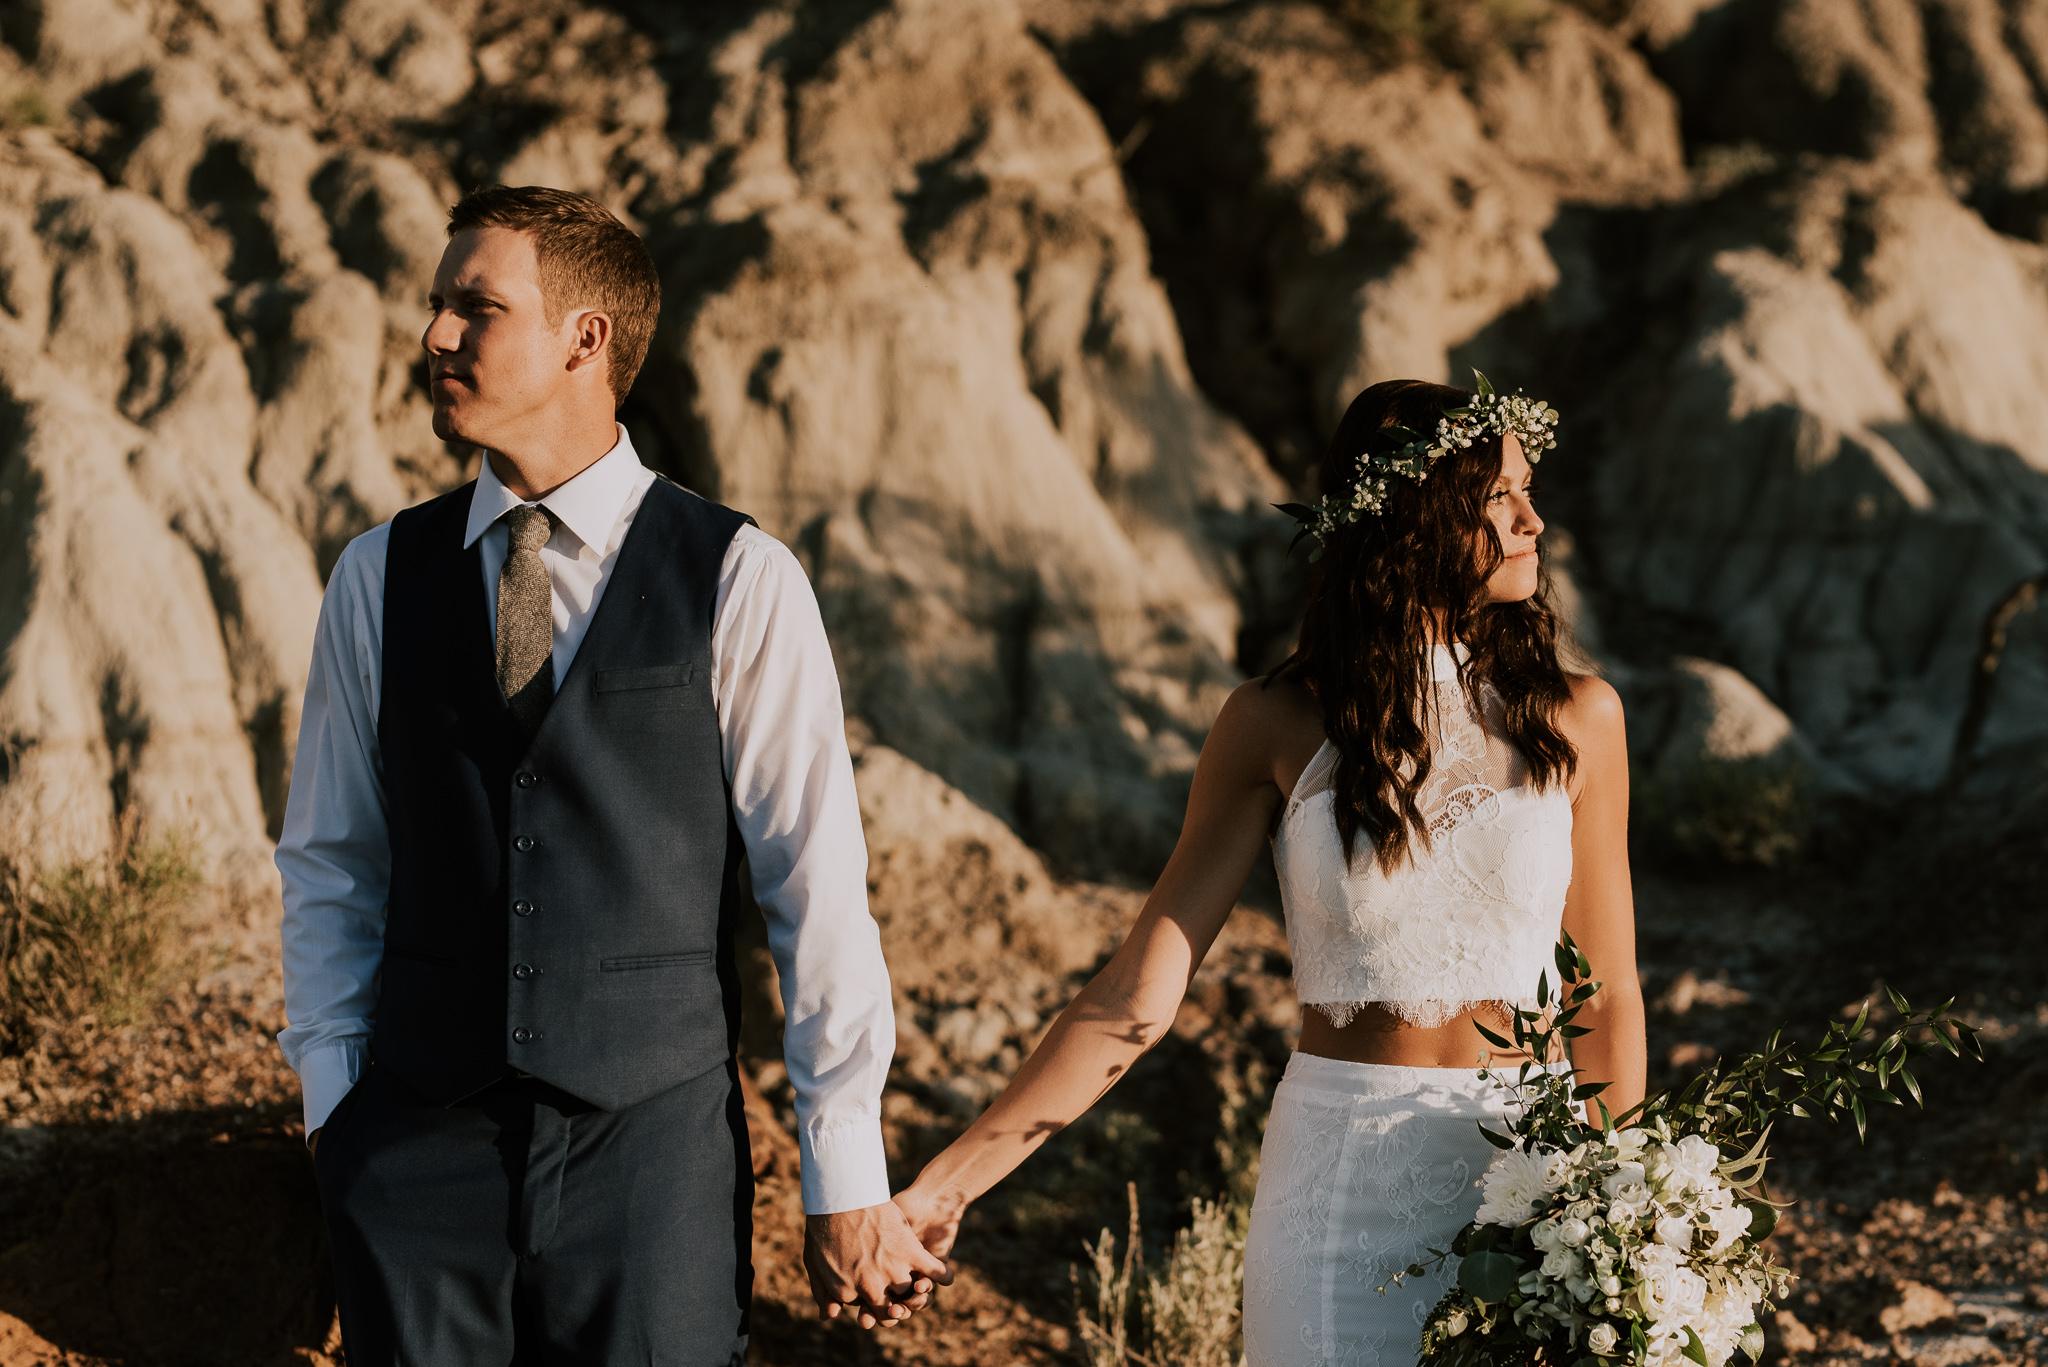 bismarck-wedding-photographer-32.jpg